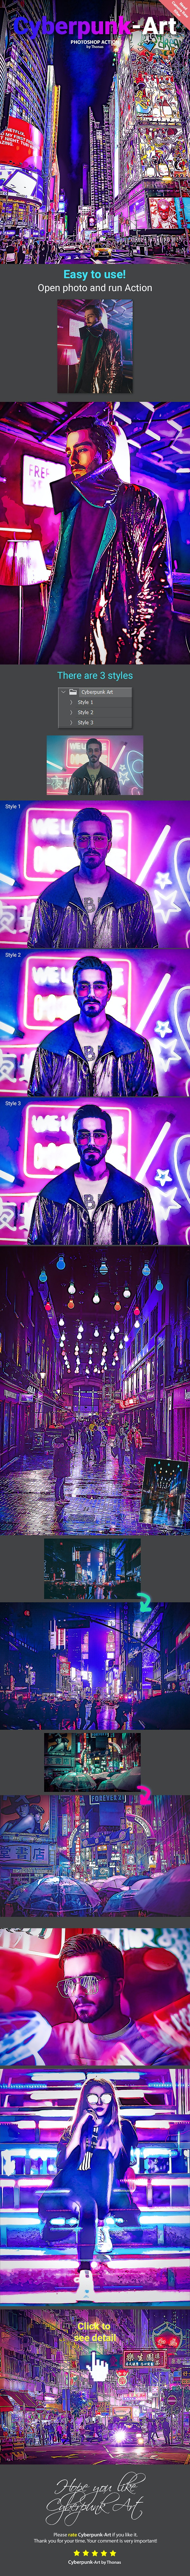 Cyberpunk Art - Photo Effects Actions